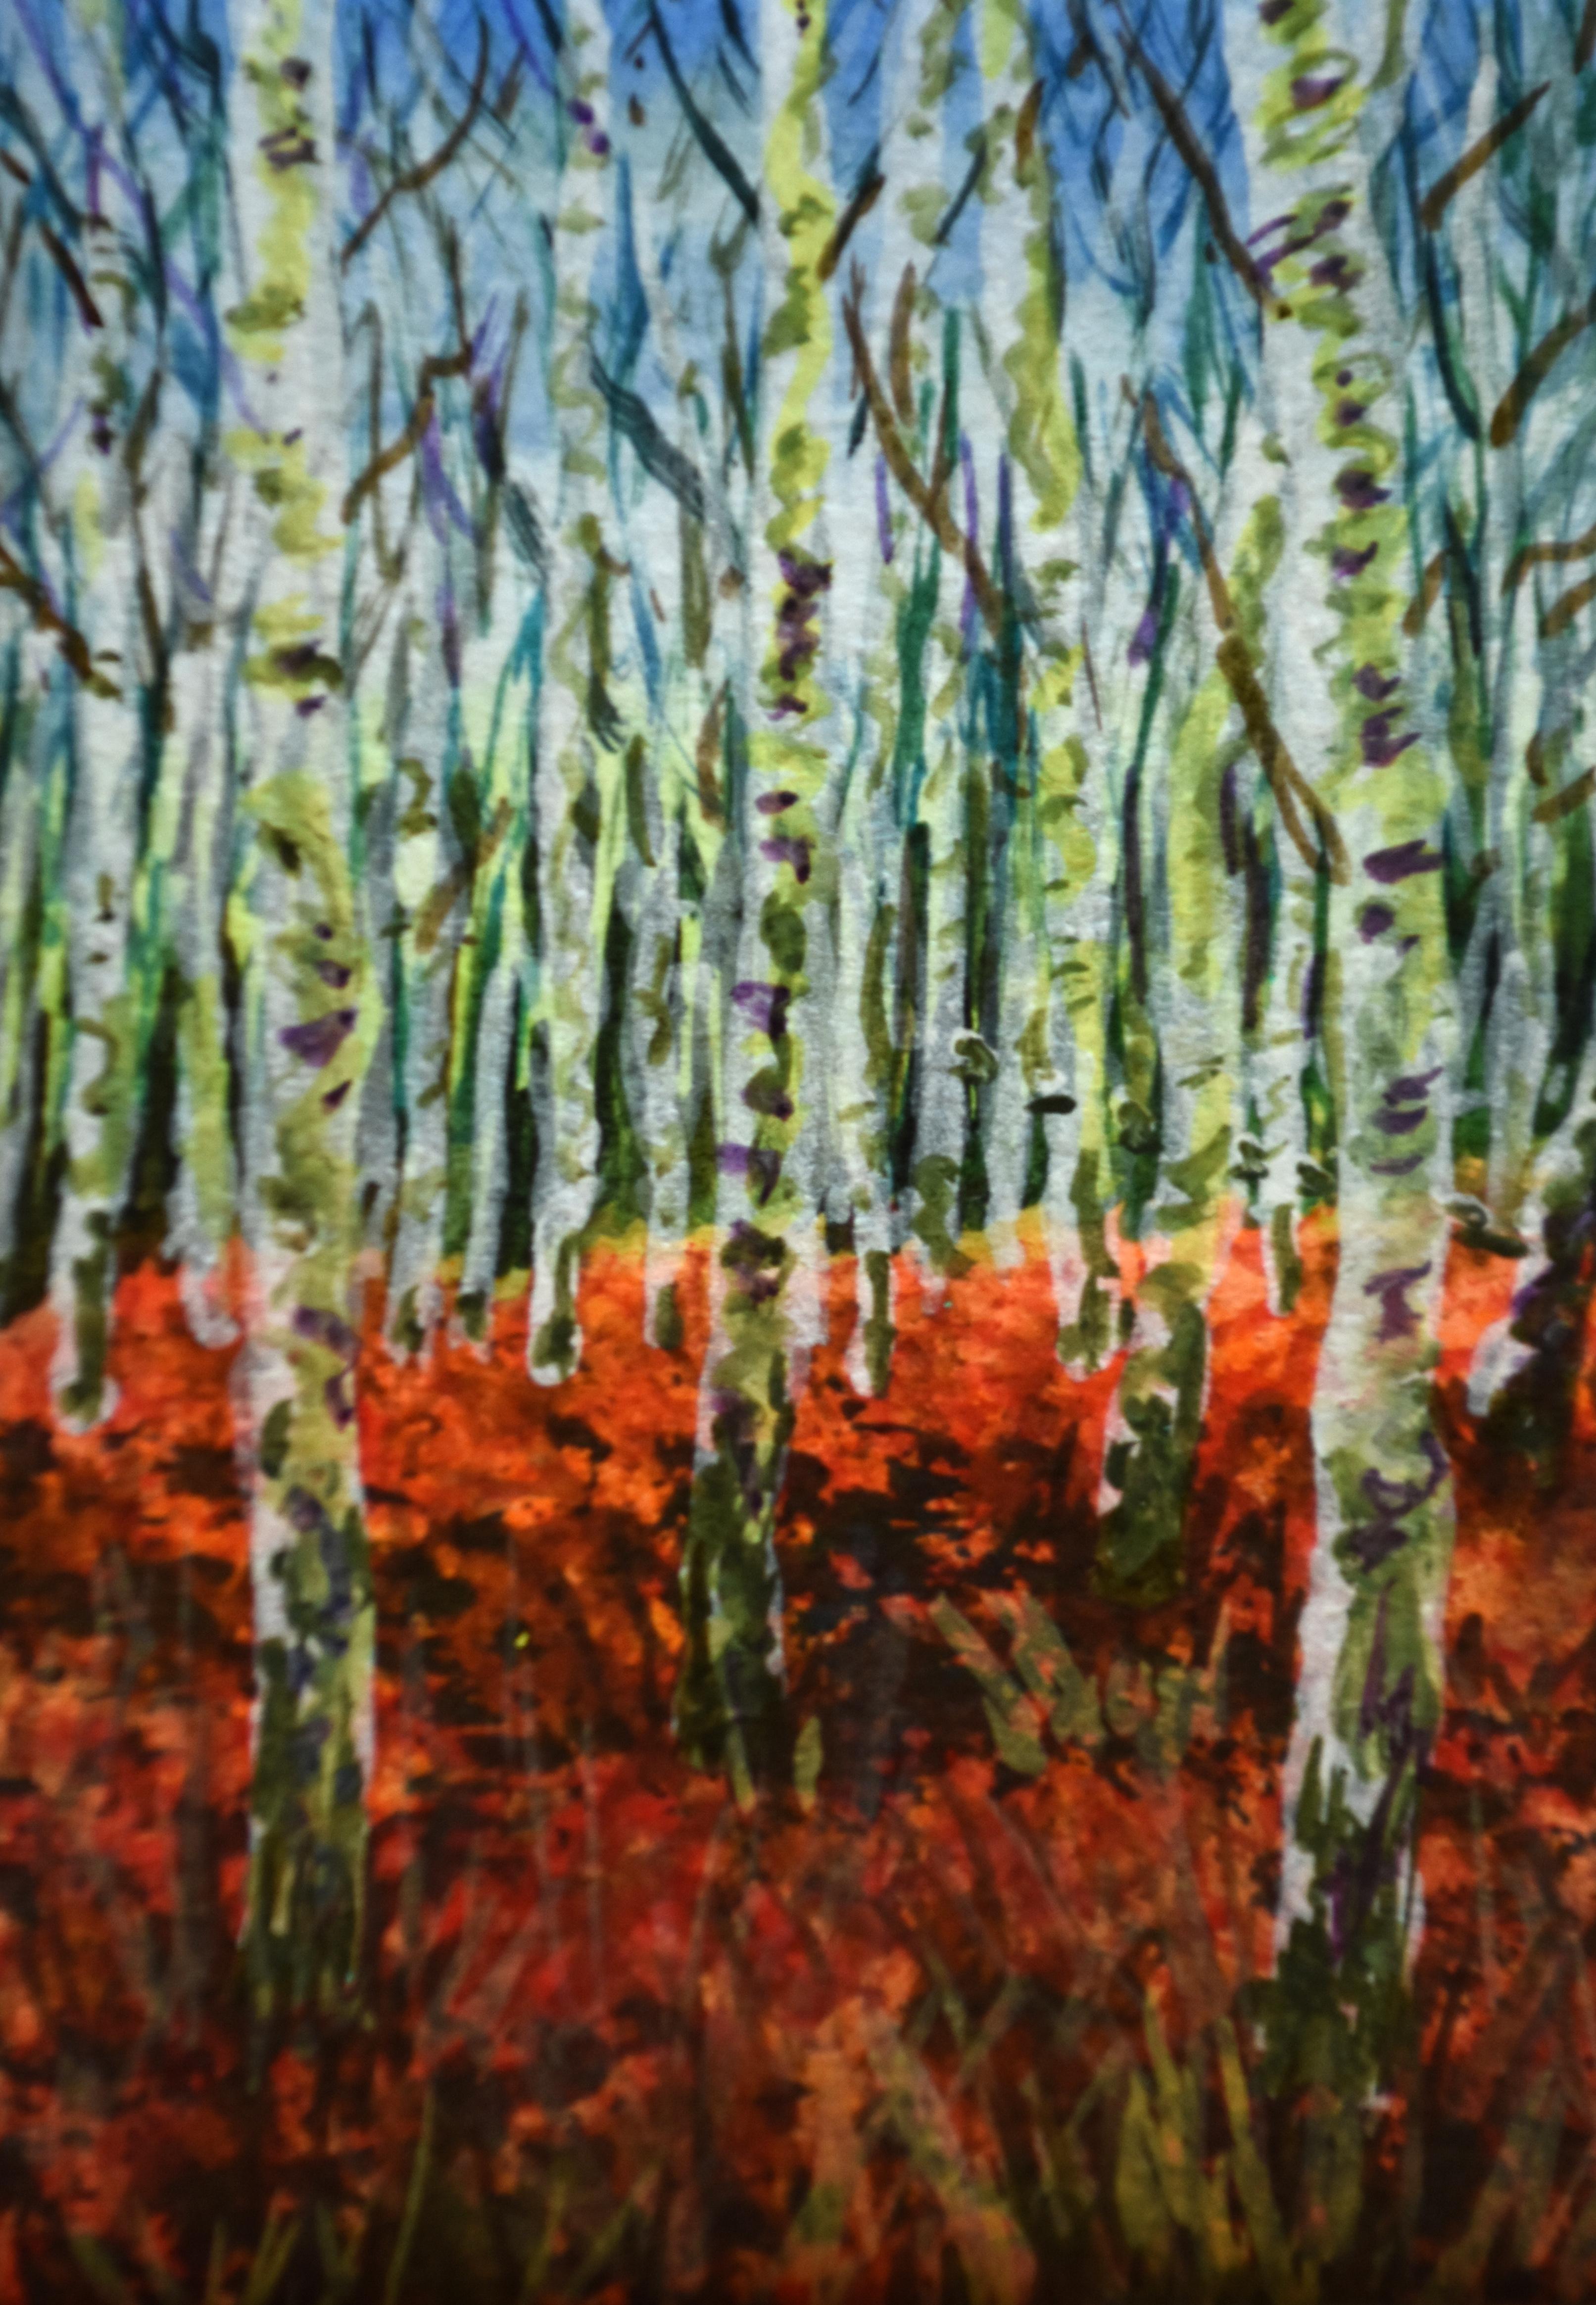 Birches and Ferns at Arne